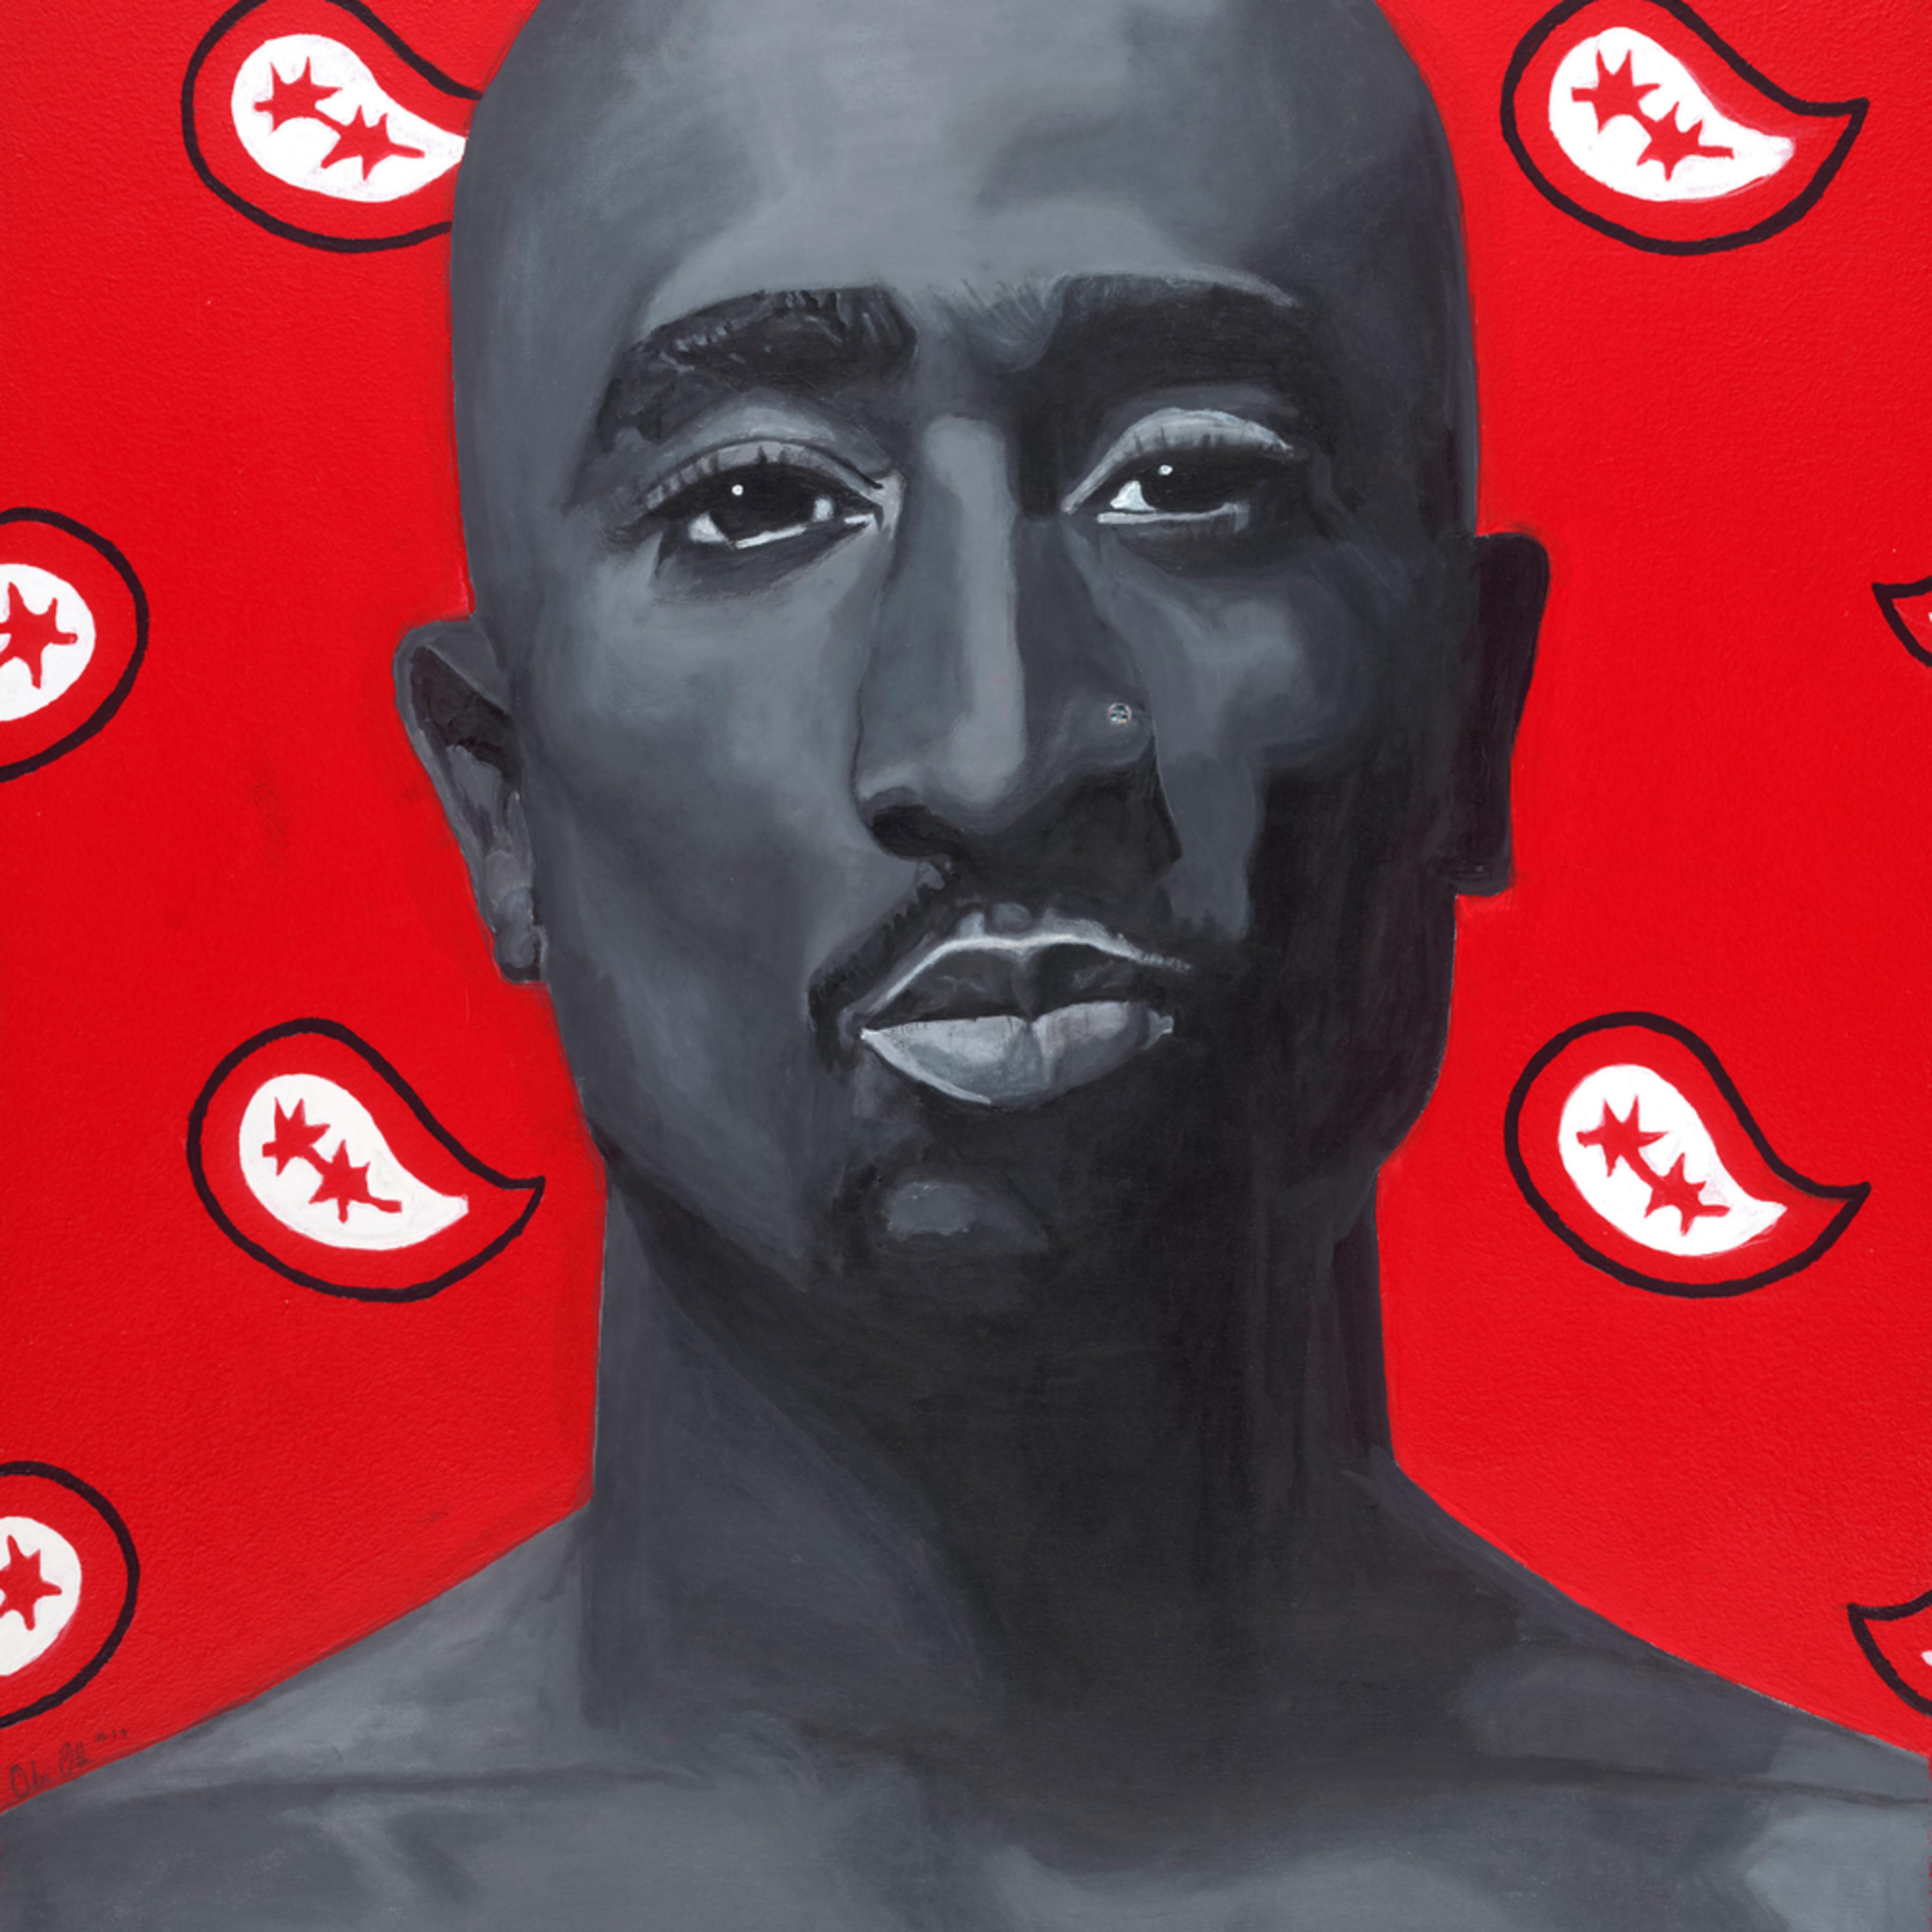 Tupac shakur iwi0h3